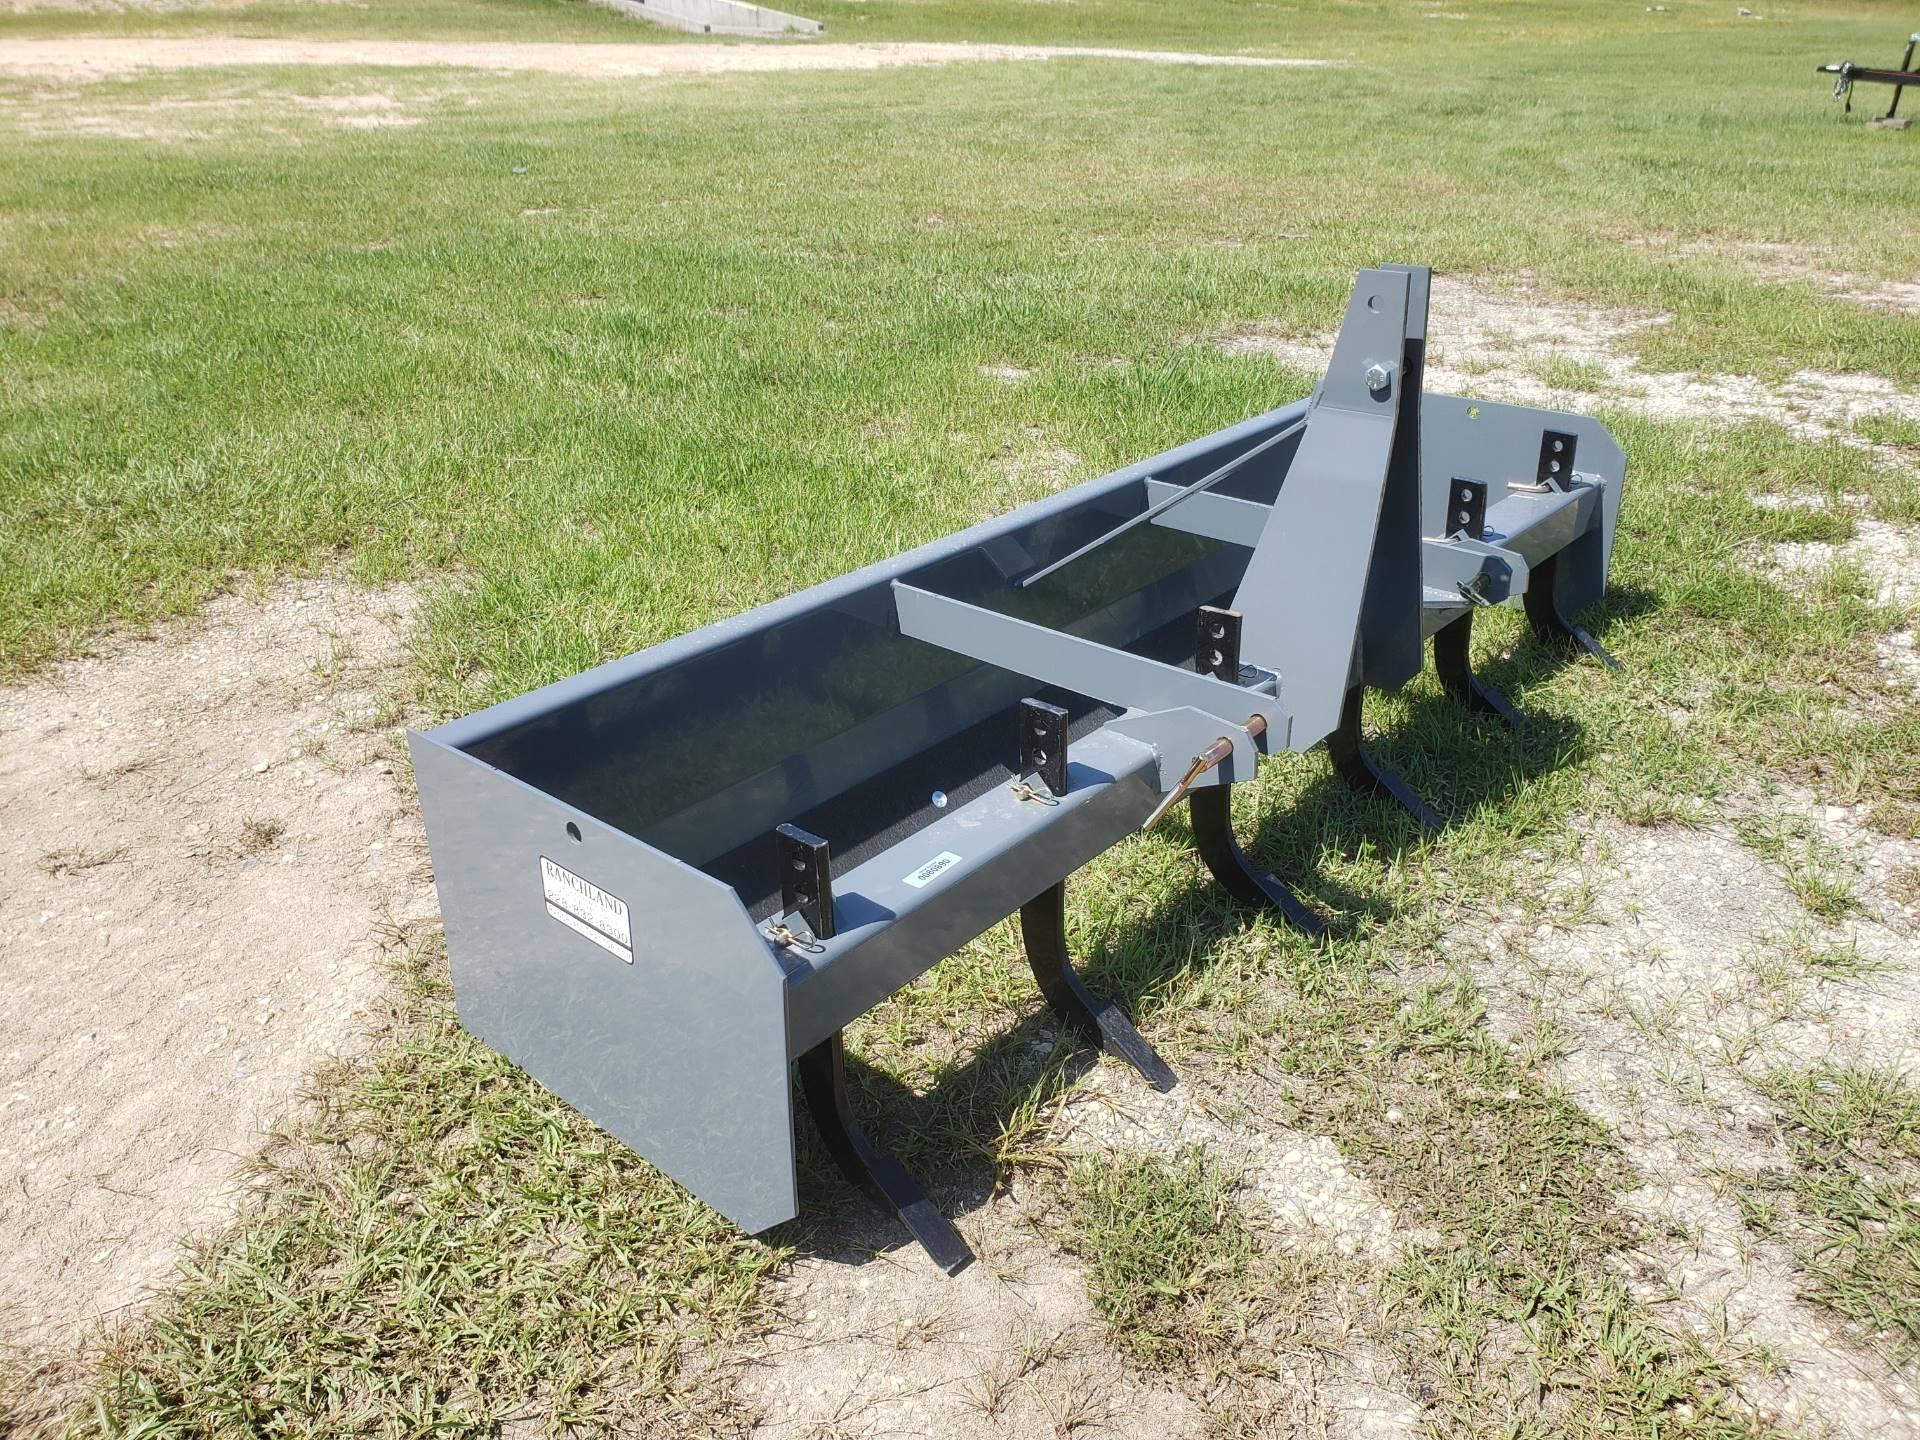 2020 Titan Implement 7' Box Blade in Saucier, Mississippi